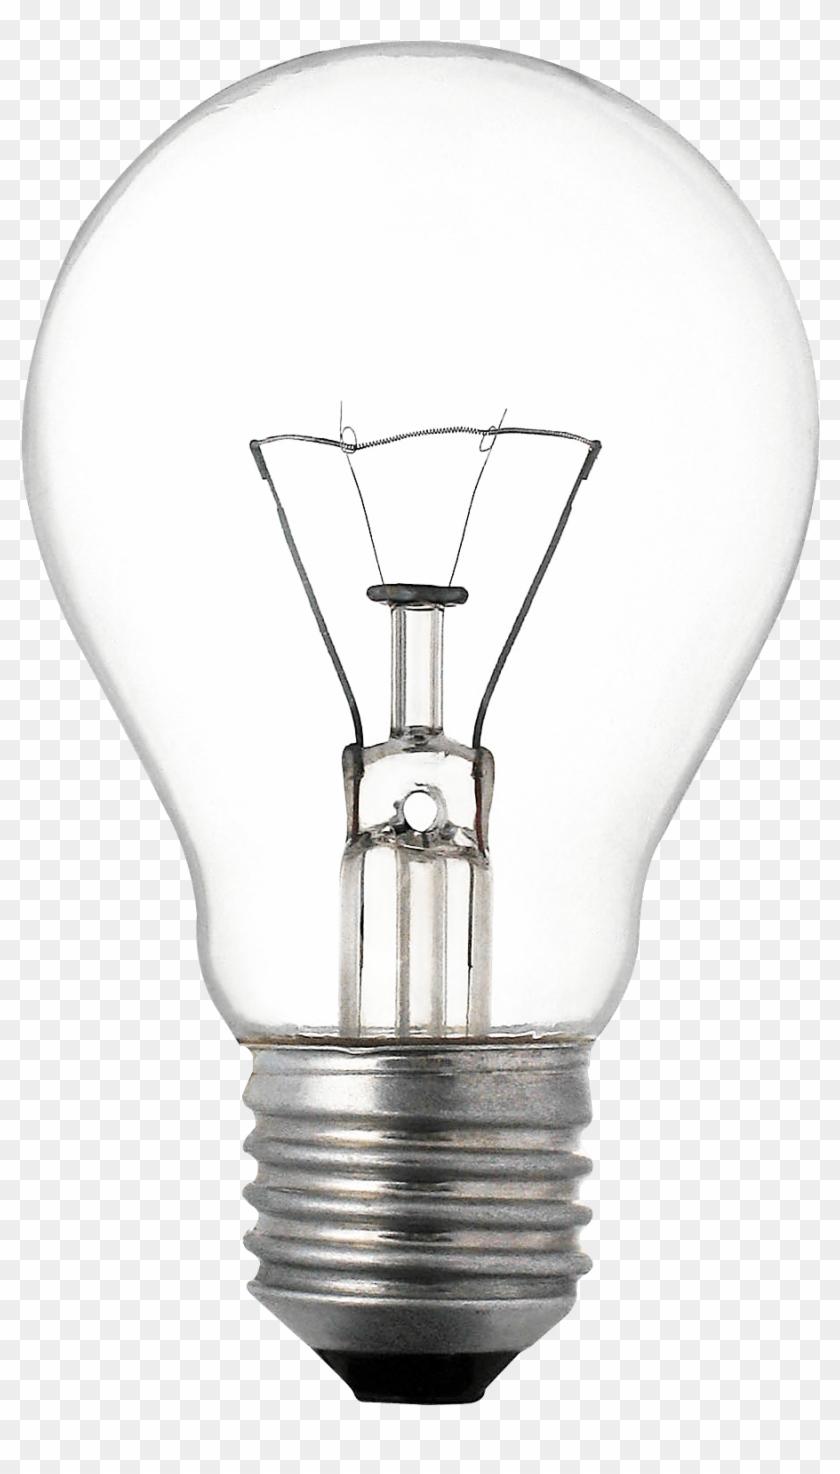 Light Bulb Png Transparent Image Pngpix - Incandescent Light Bulb Clipart #341803